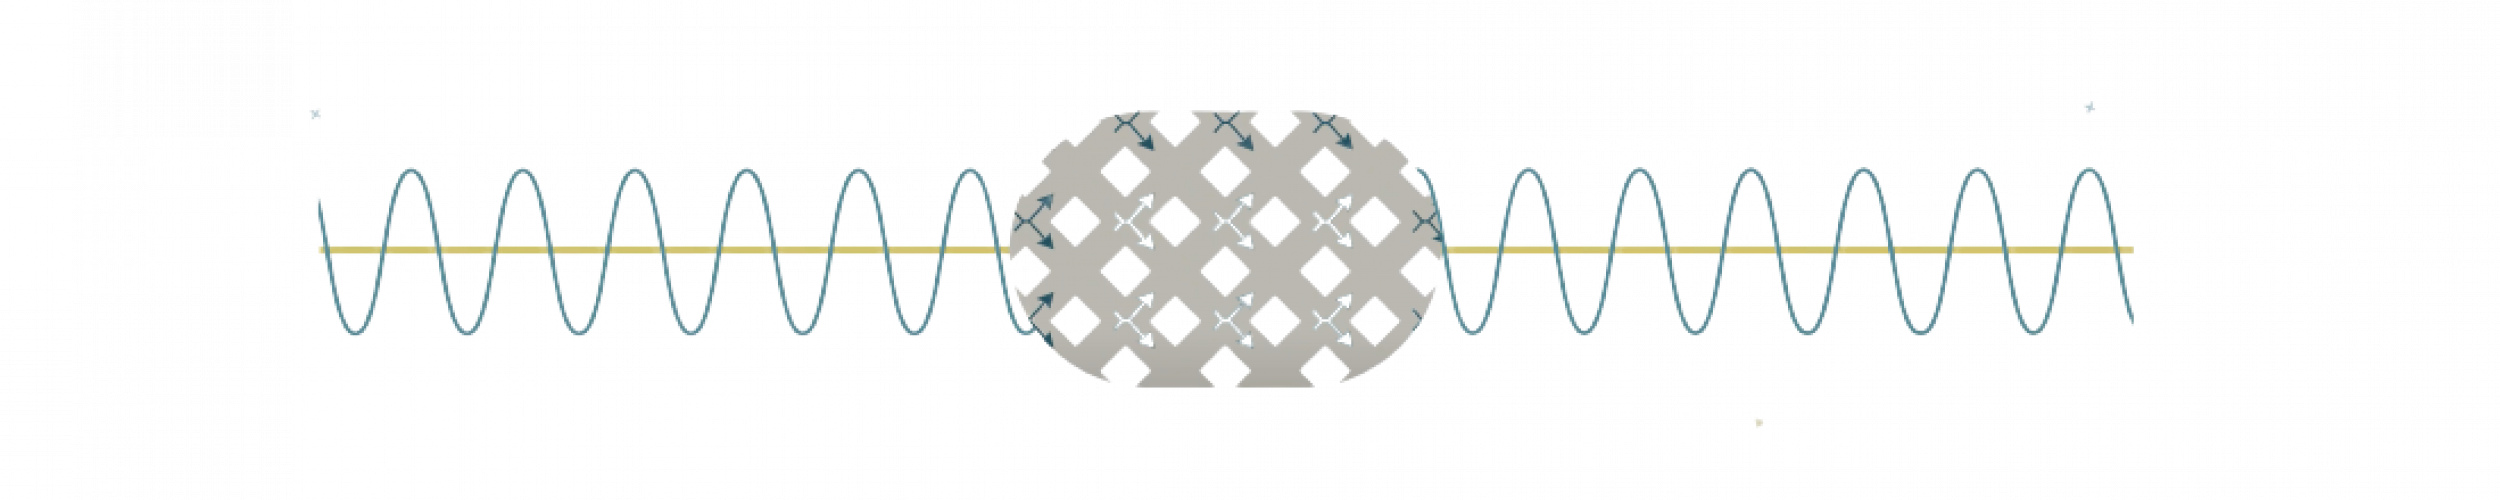 COSTA™ Technology